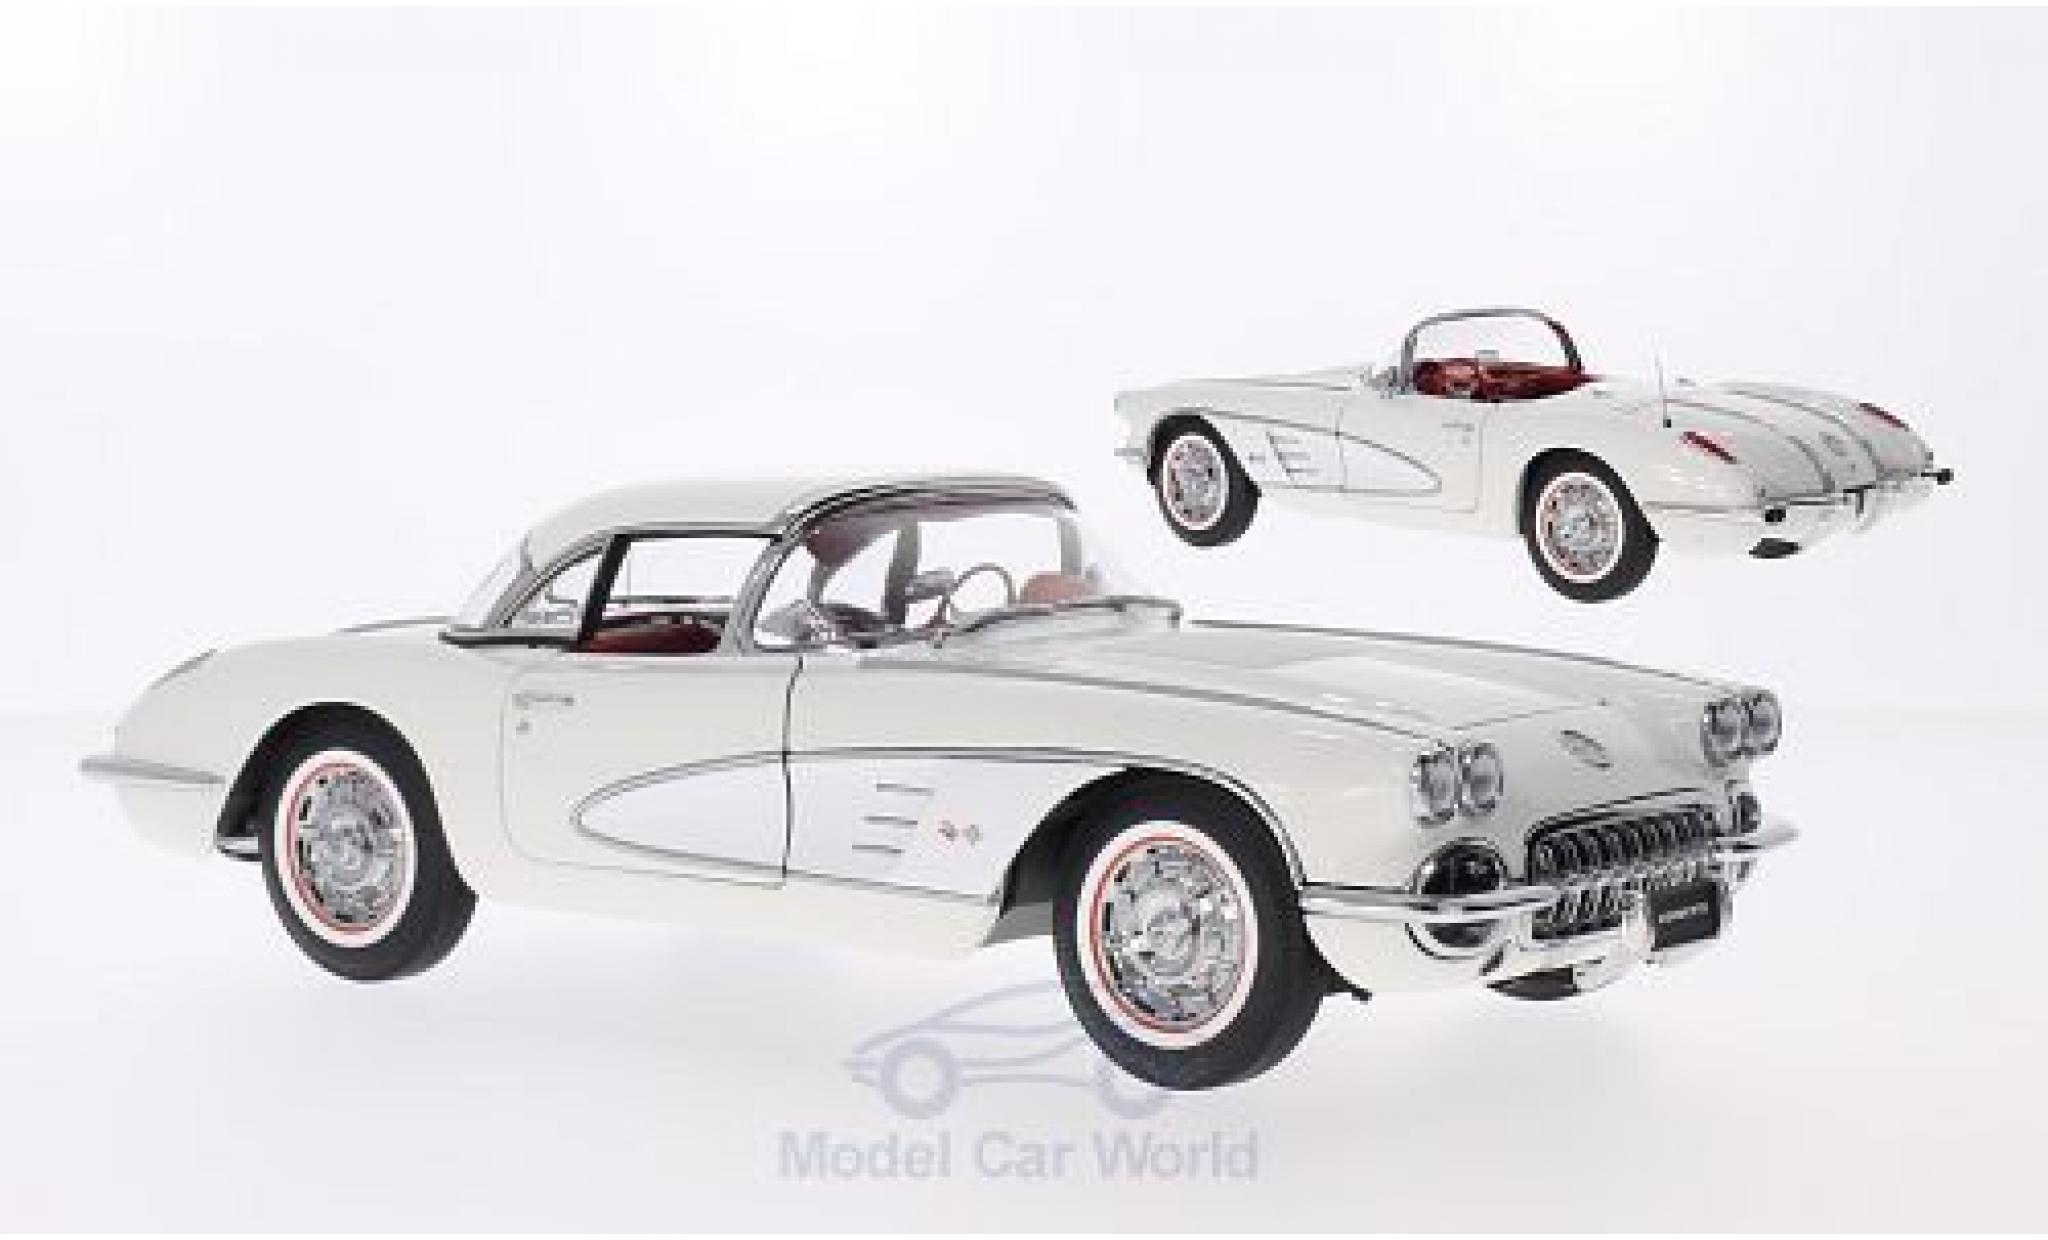 Chevrolet Corvette C1 1/18 AUTOart  white/grey 1958 Hardtop zum auflegen liegt bei